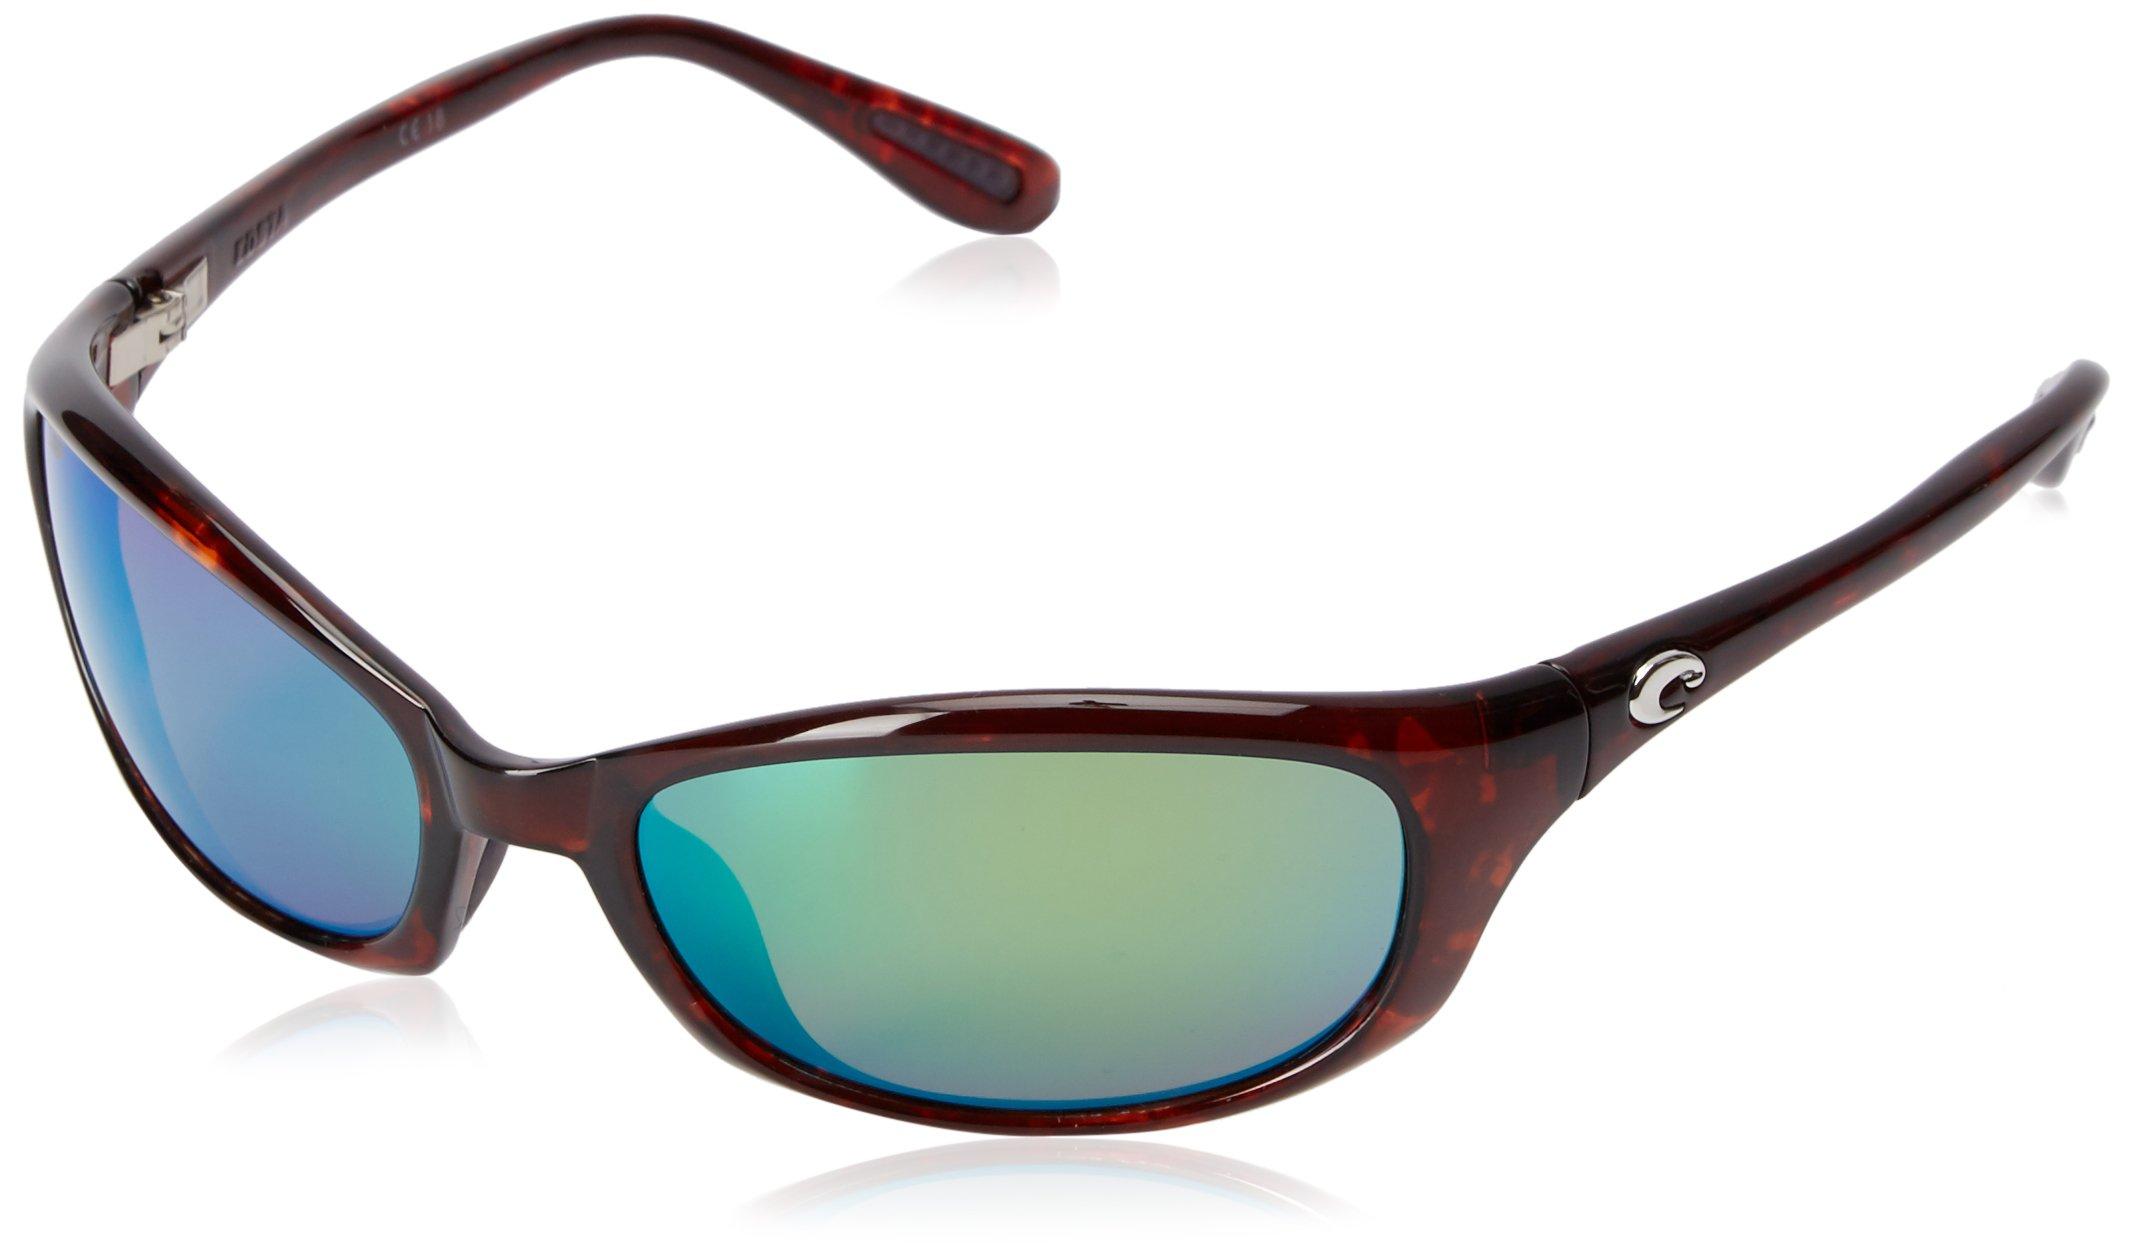 Costa Del Mar Harpoon Sunglasses, Tortoise, Green Mirror 580 Plastic Lens, 61.5 mm by Costa Del Mar